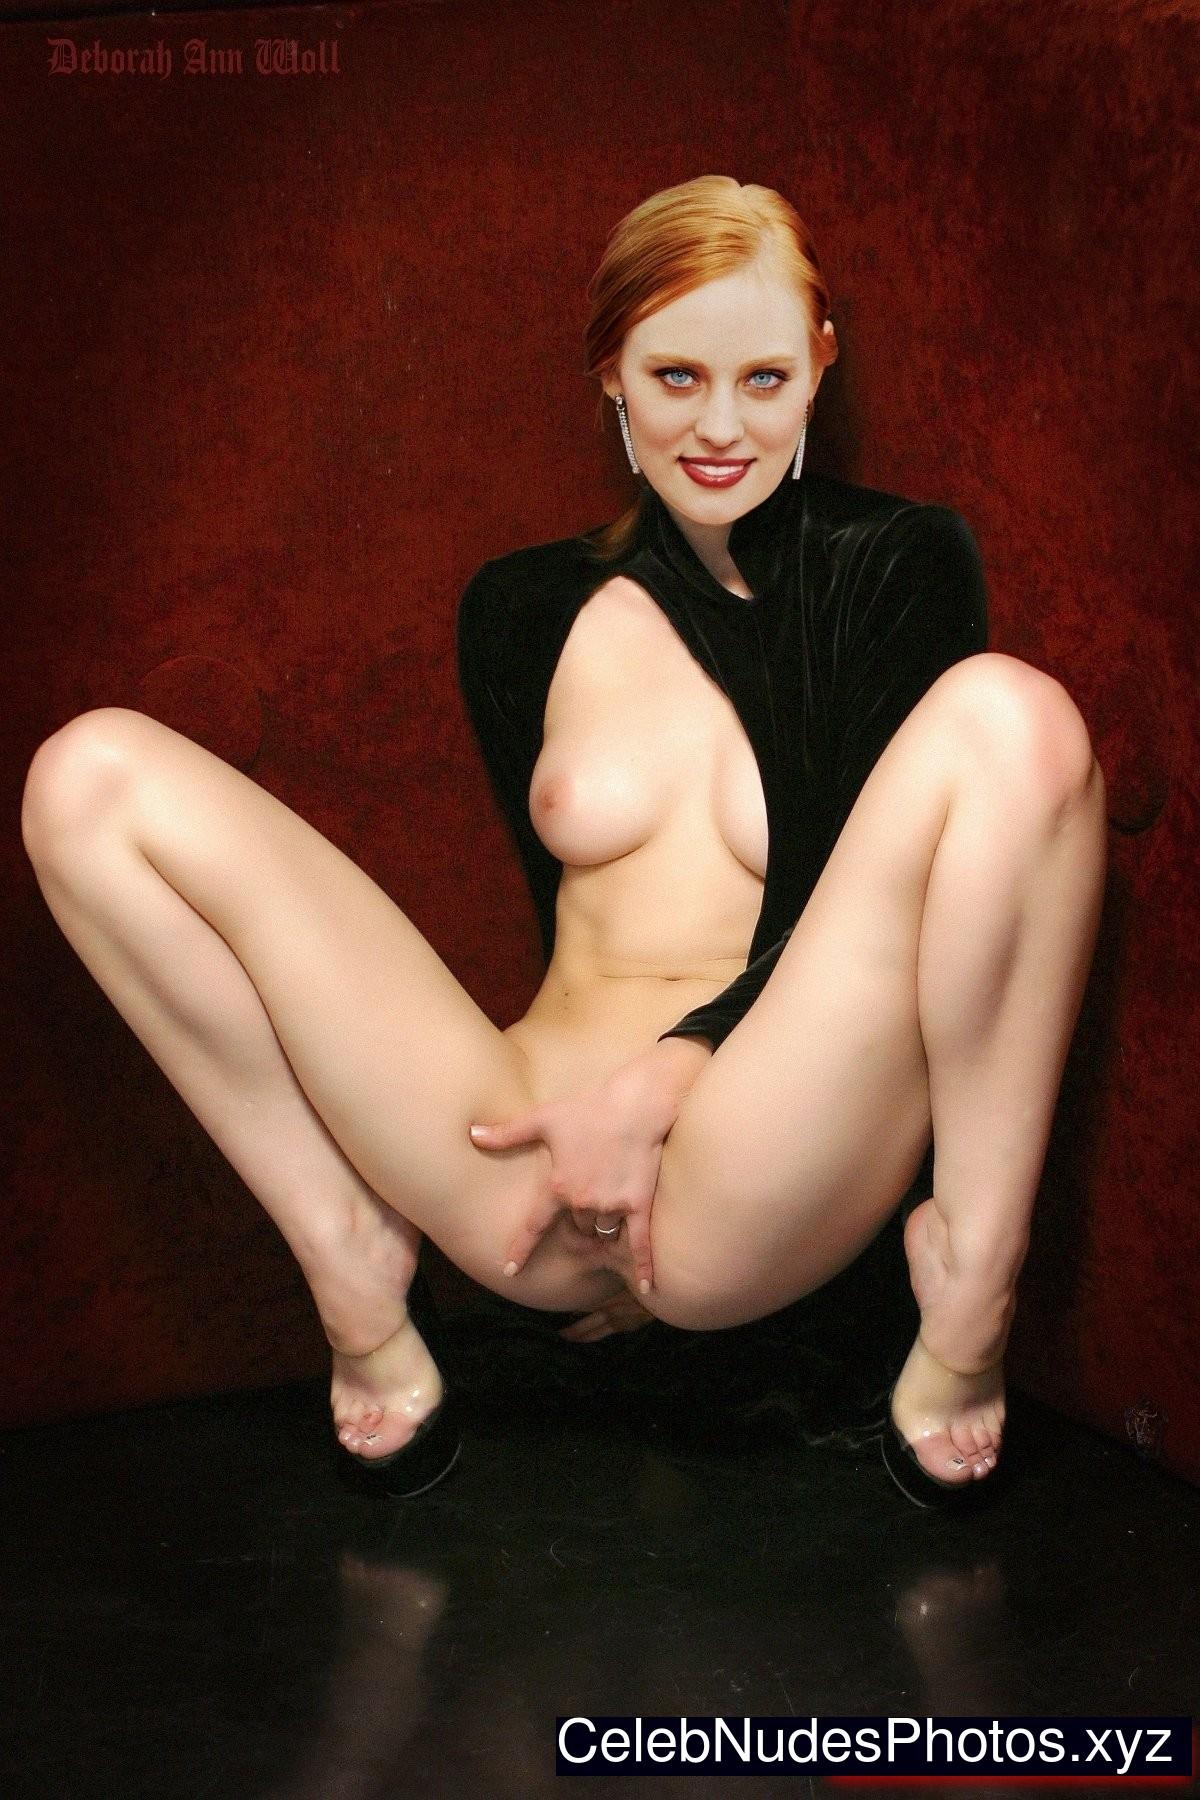 Eleanor tomlinson naked